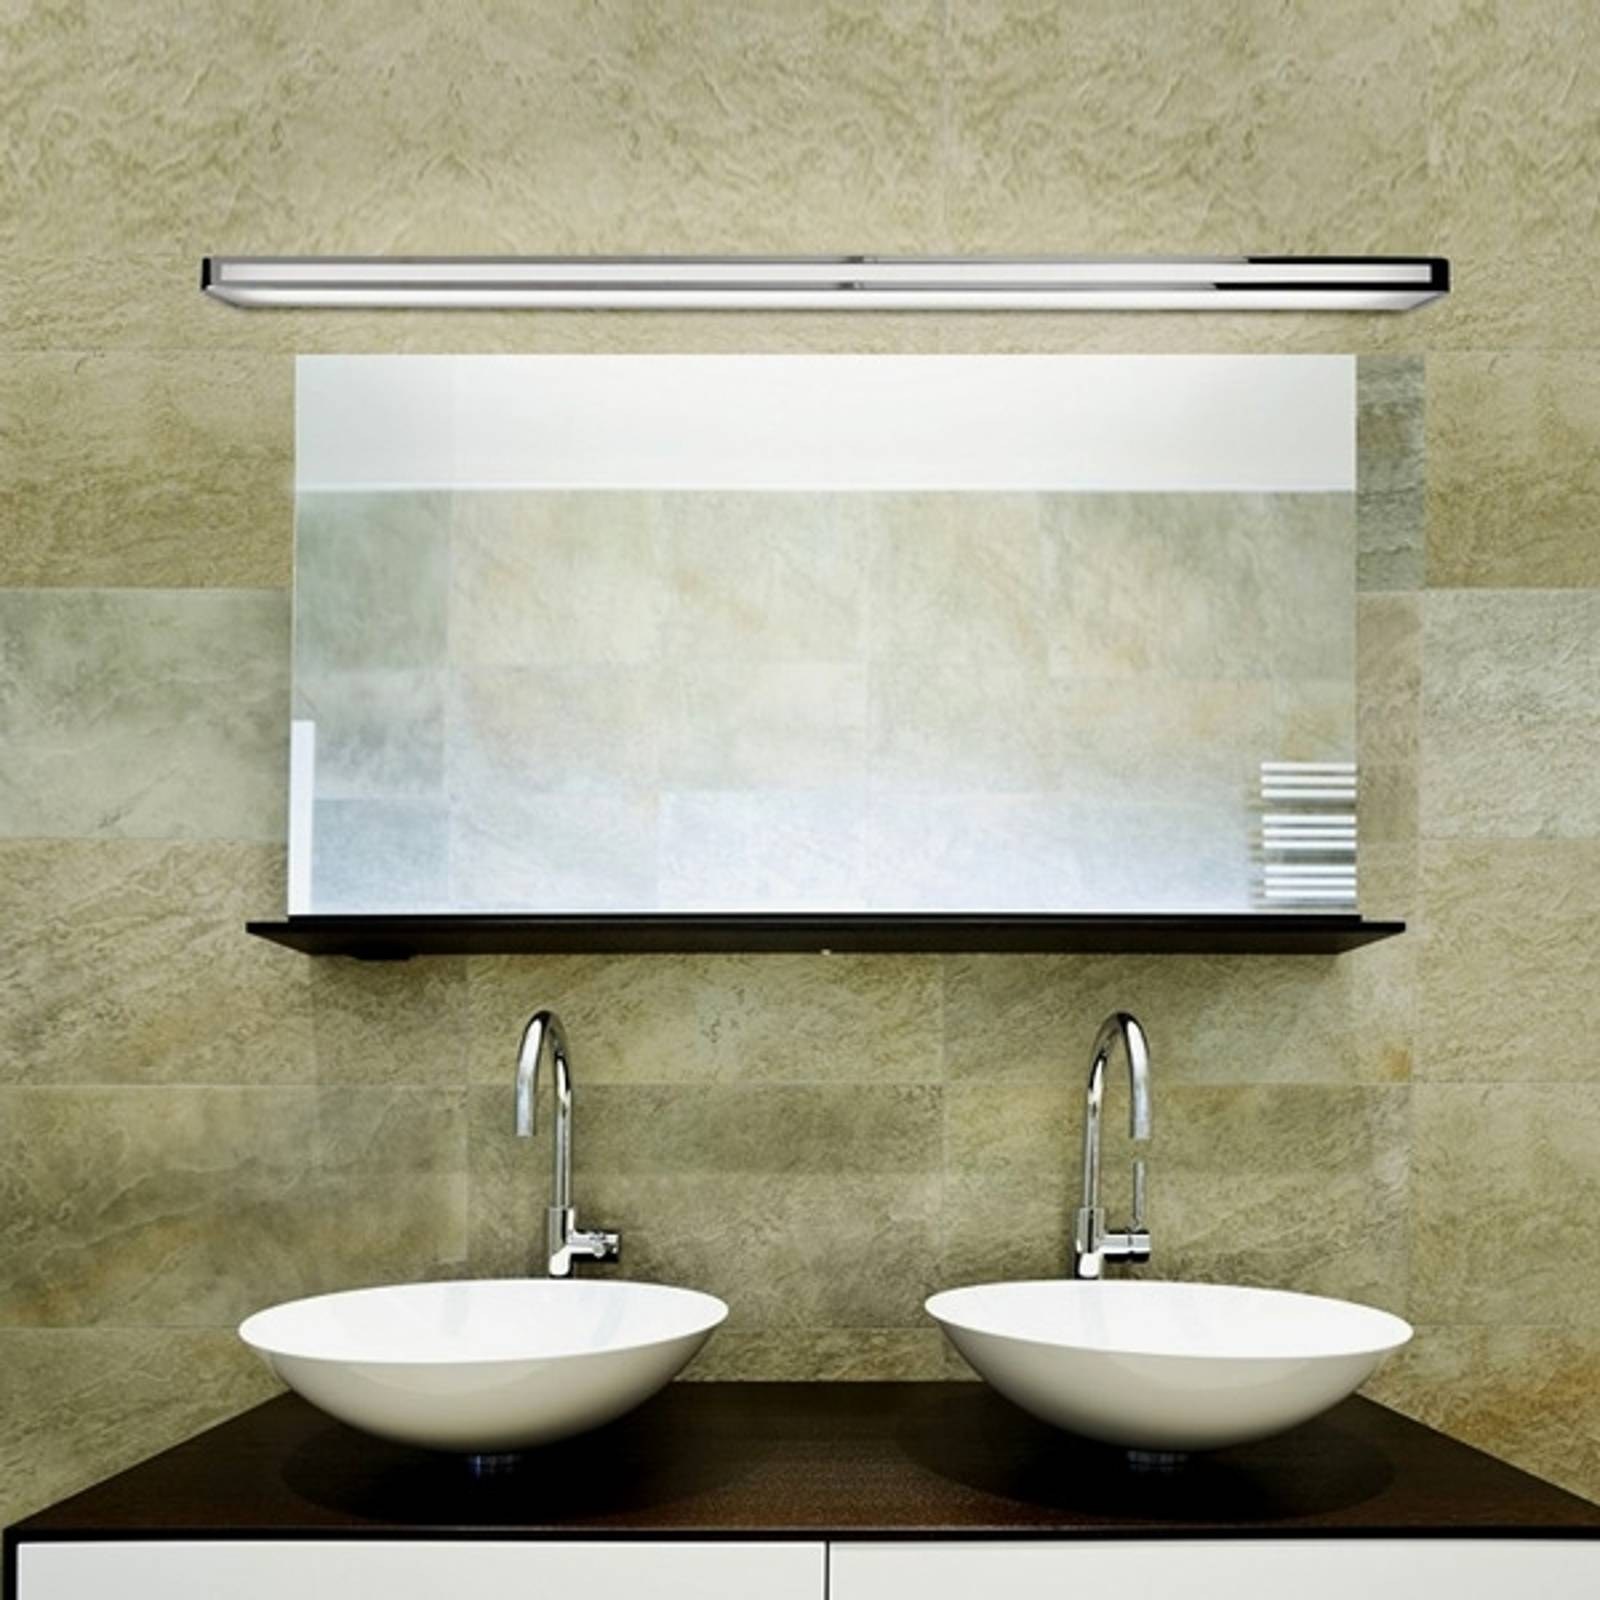 Arcos - veelzijdige wandlamp, chroom, 150 cm